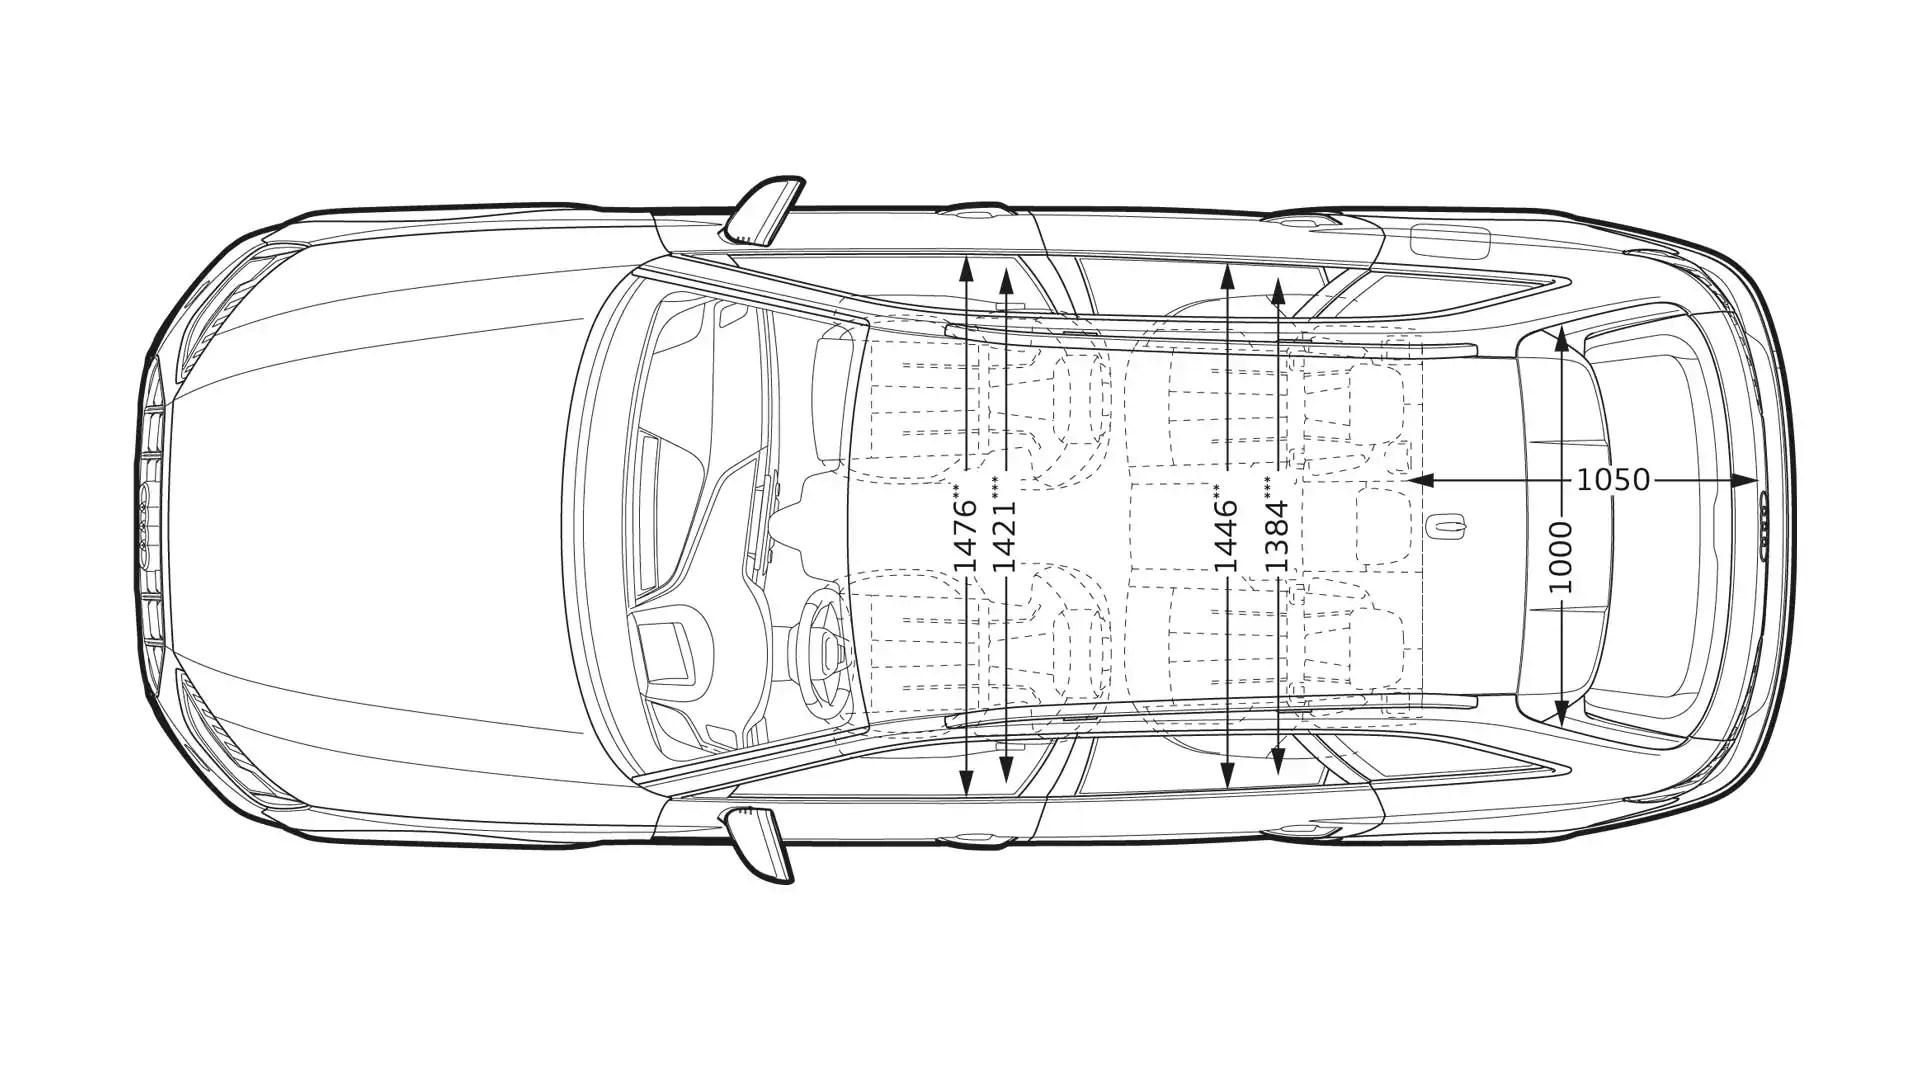 Abmessungen Gt A4 Allroad Quattro Gt Gamma Audi A4 Gt Audi Italia